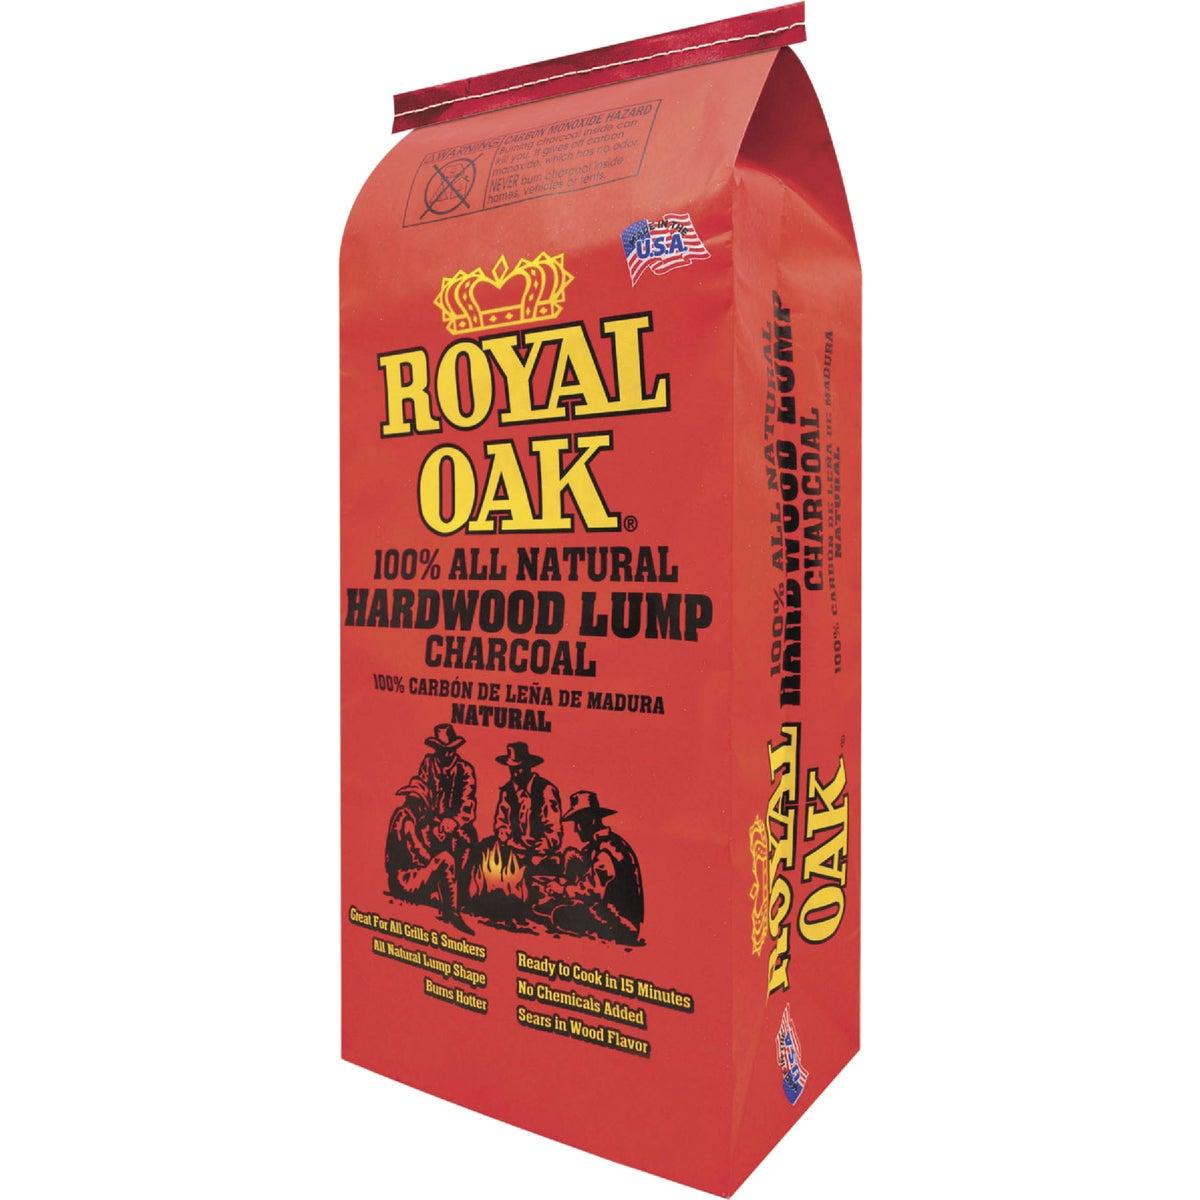 17.6# NAT LUMP CHARCOAL - 195-228-017 by Royal Oak